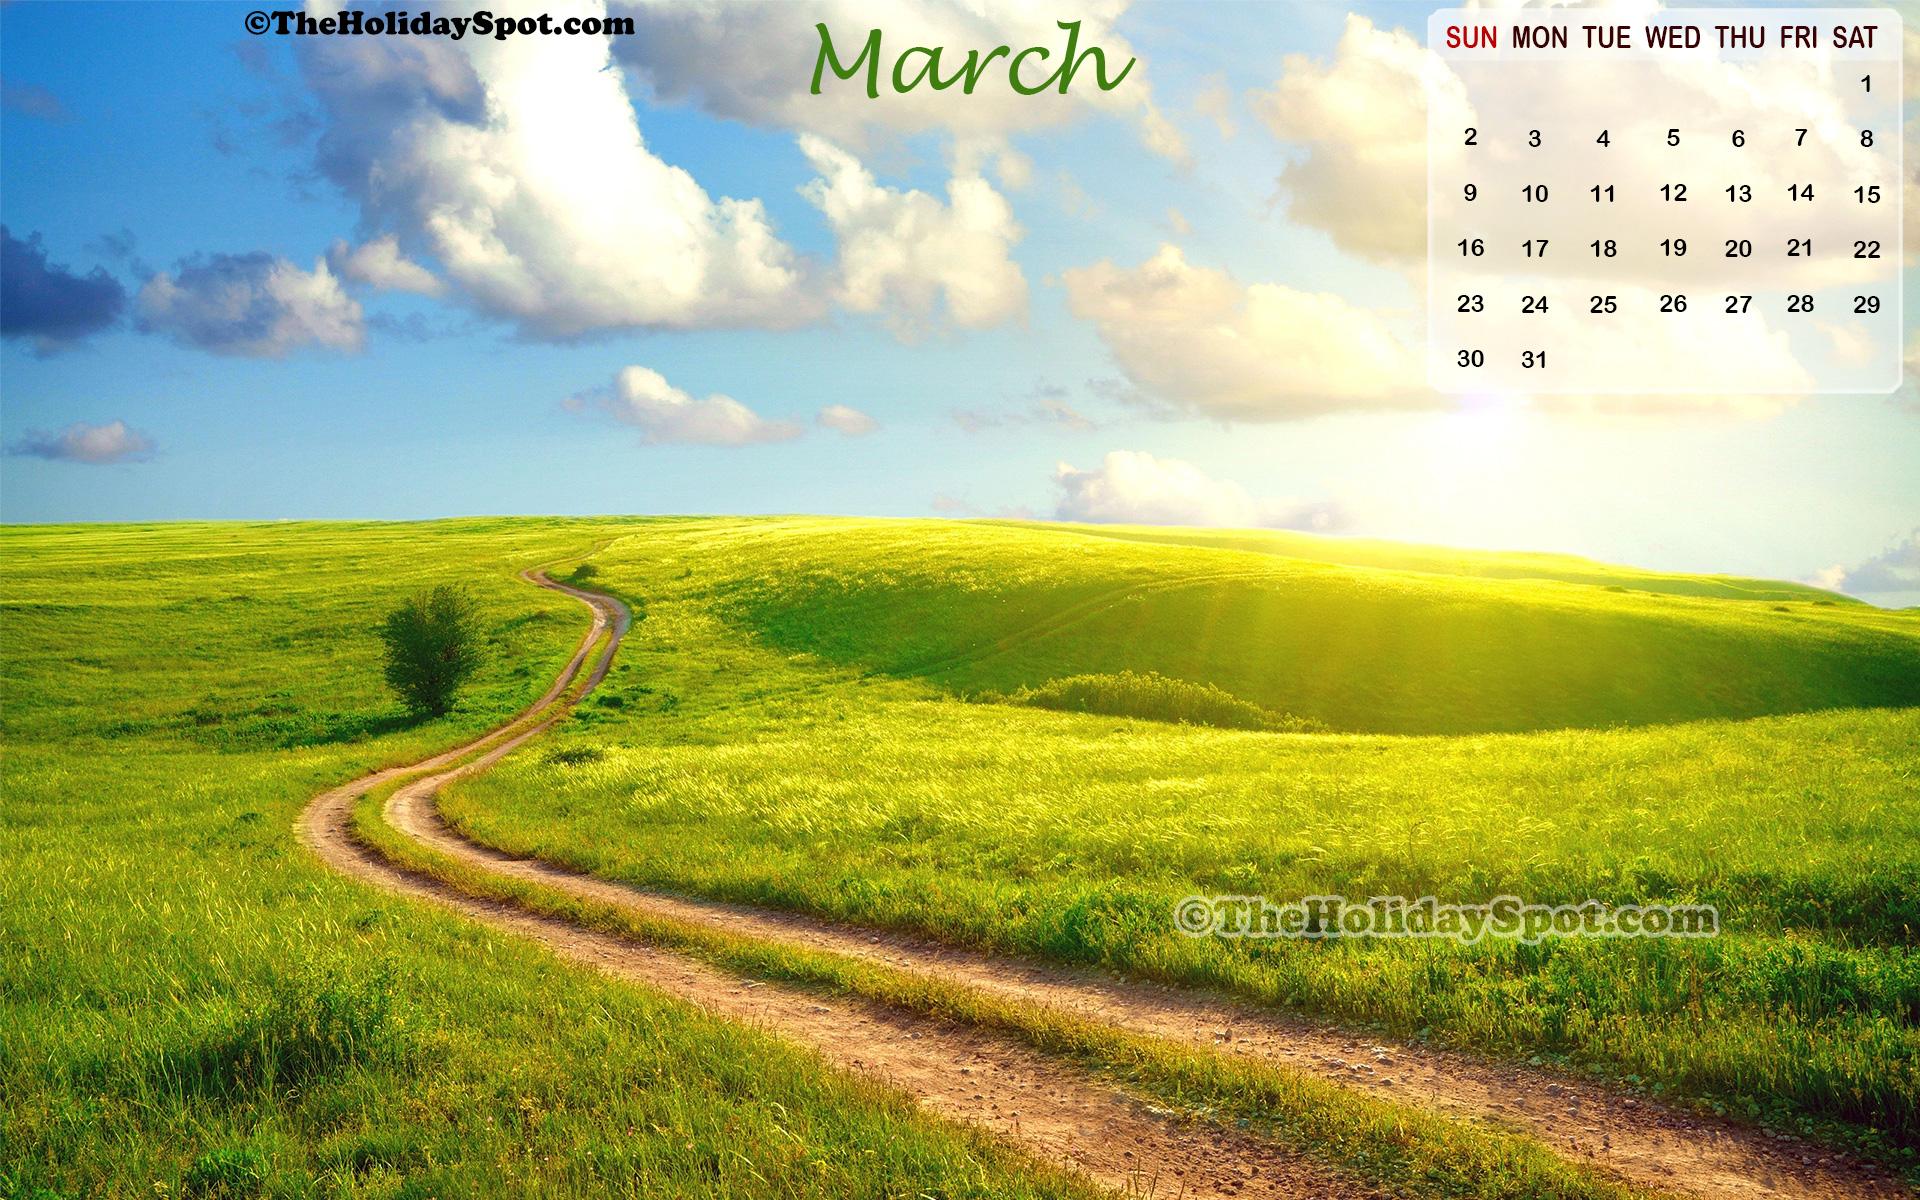 High resolution calendar wallpaper of March 2014 featuring lustrous 1920x1200